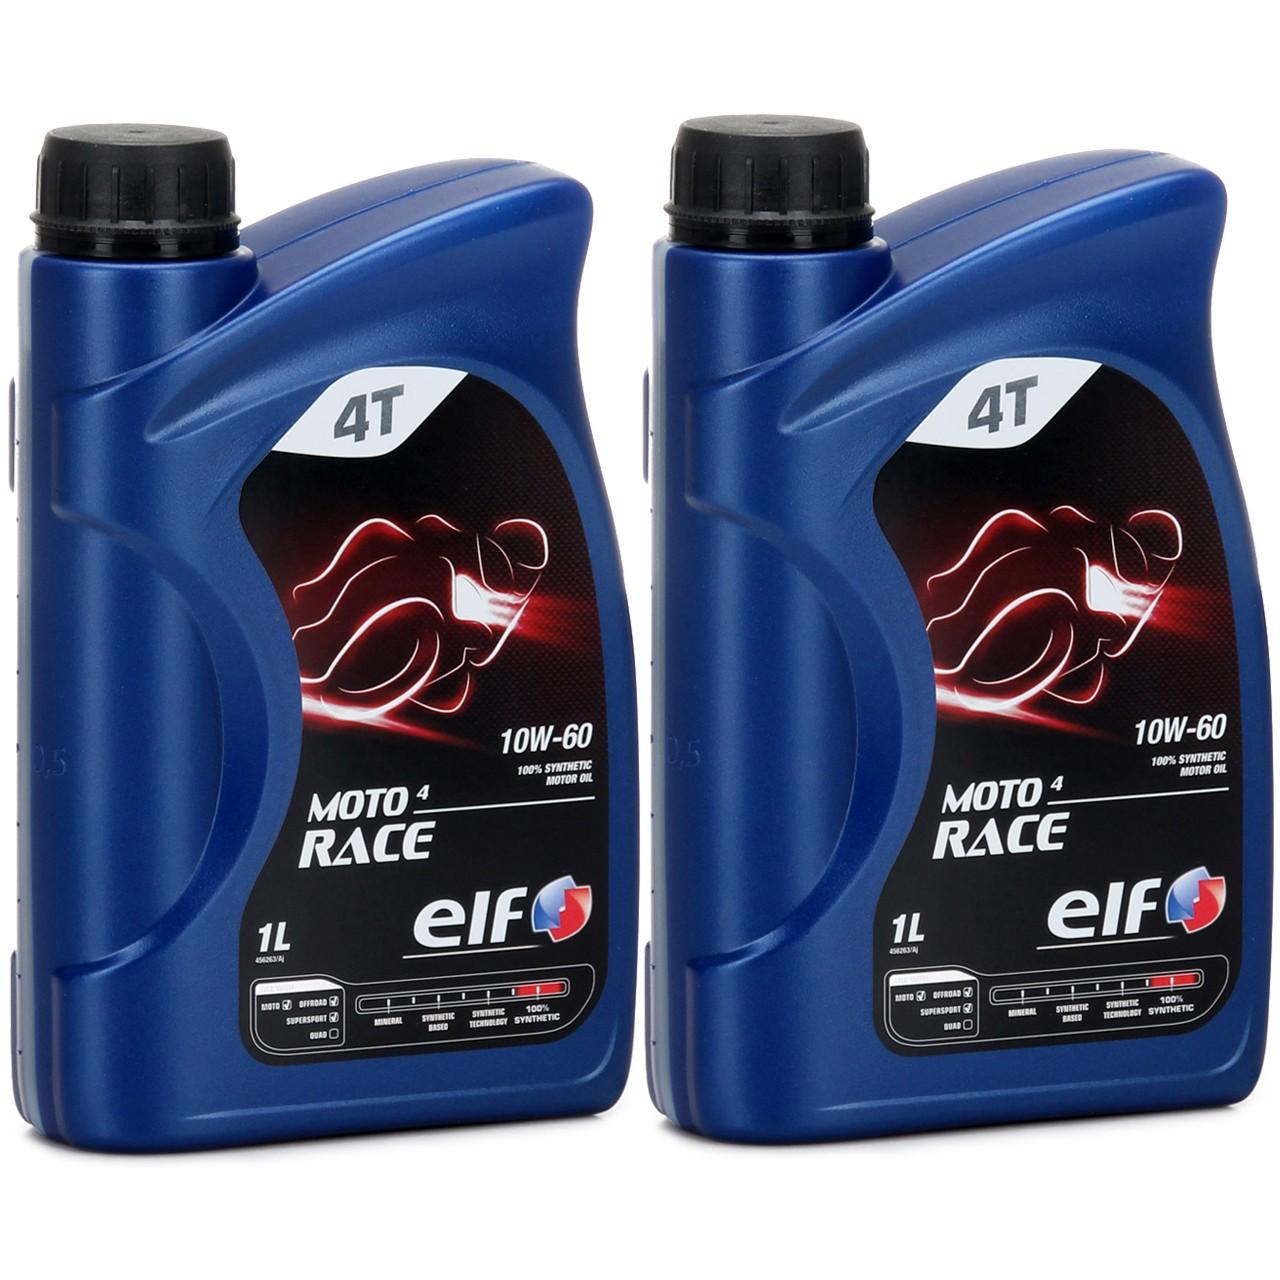 ELF Motoröl ÖL 4T 4-TAKT MOTO 4 RACE 10W-60 10W60 API SN JASO MA2 - 2L 2 Liter